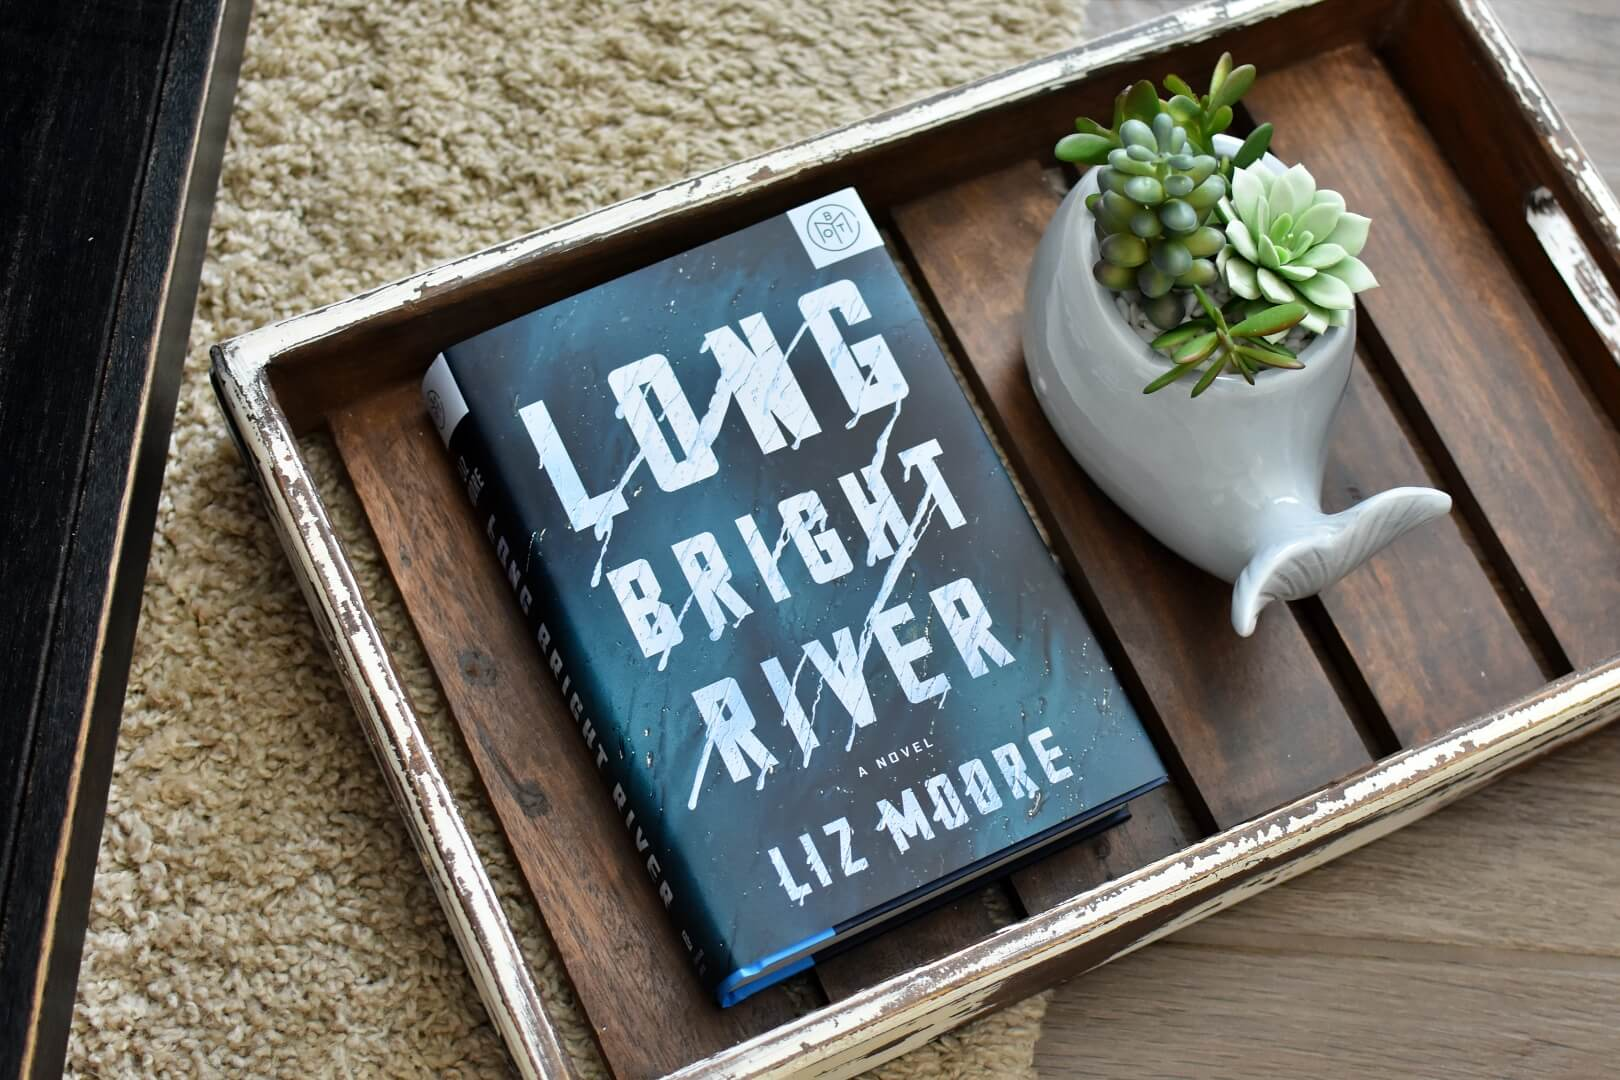 long bright river book club questions - book club chat